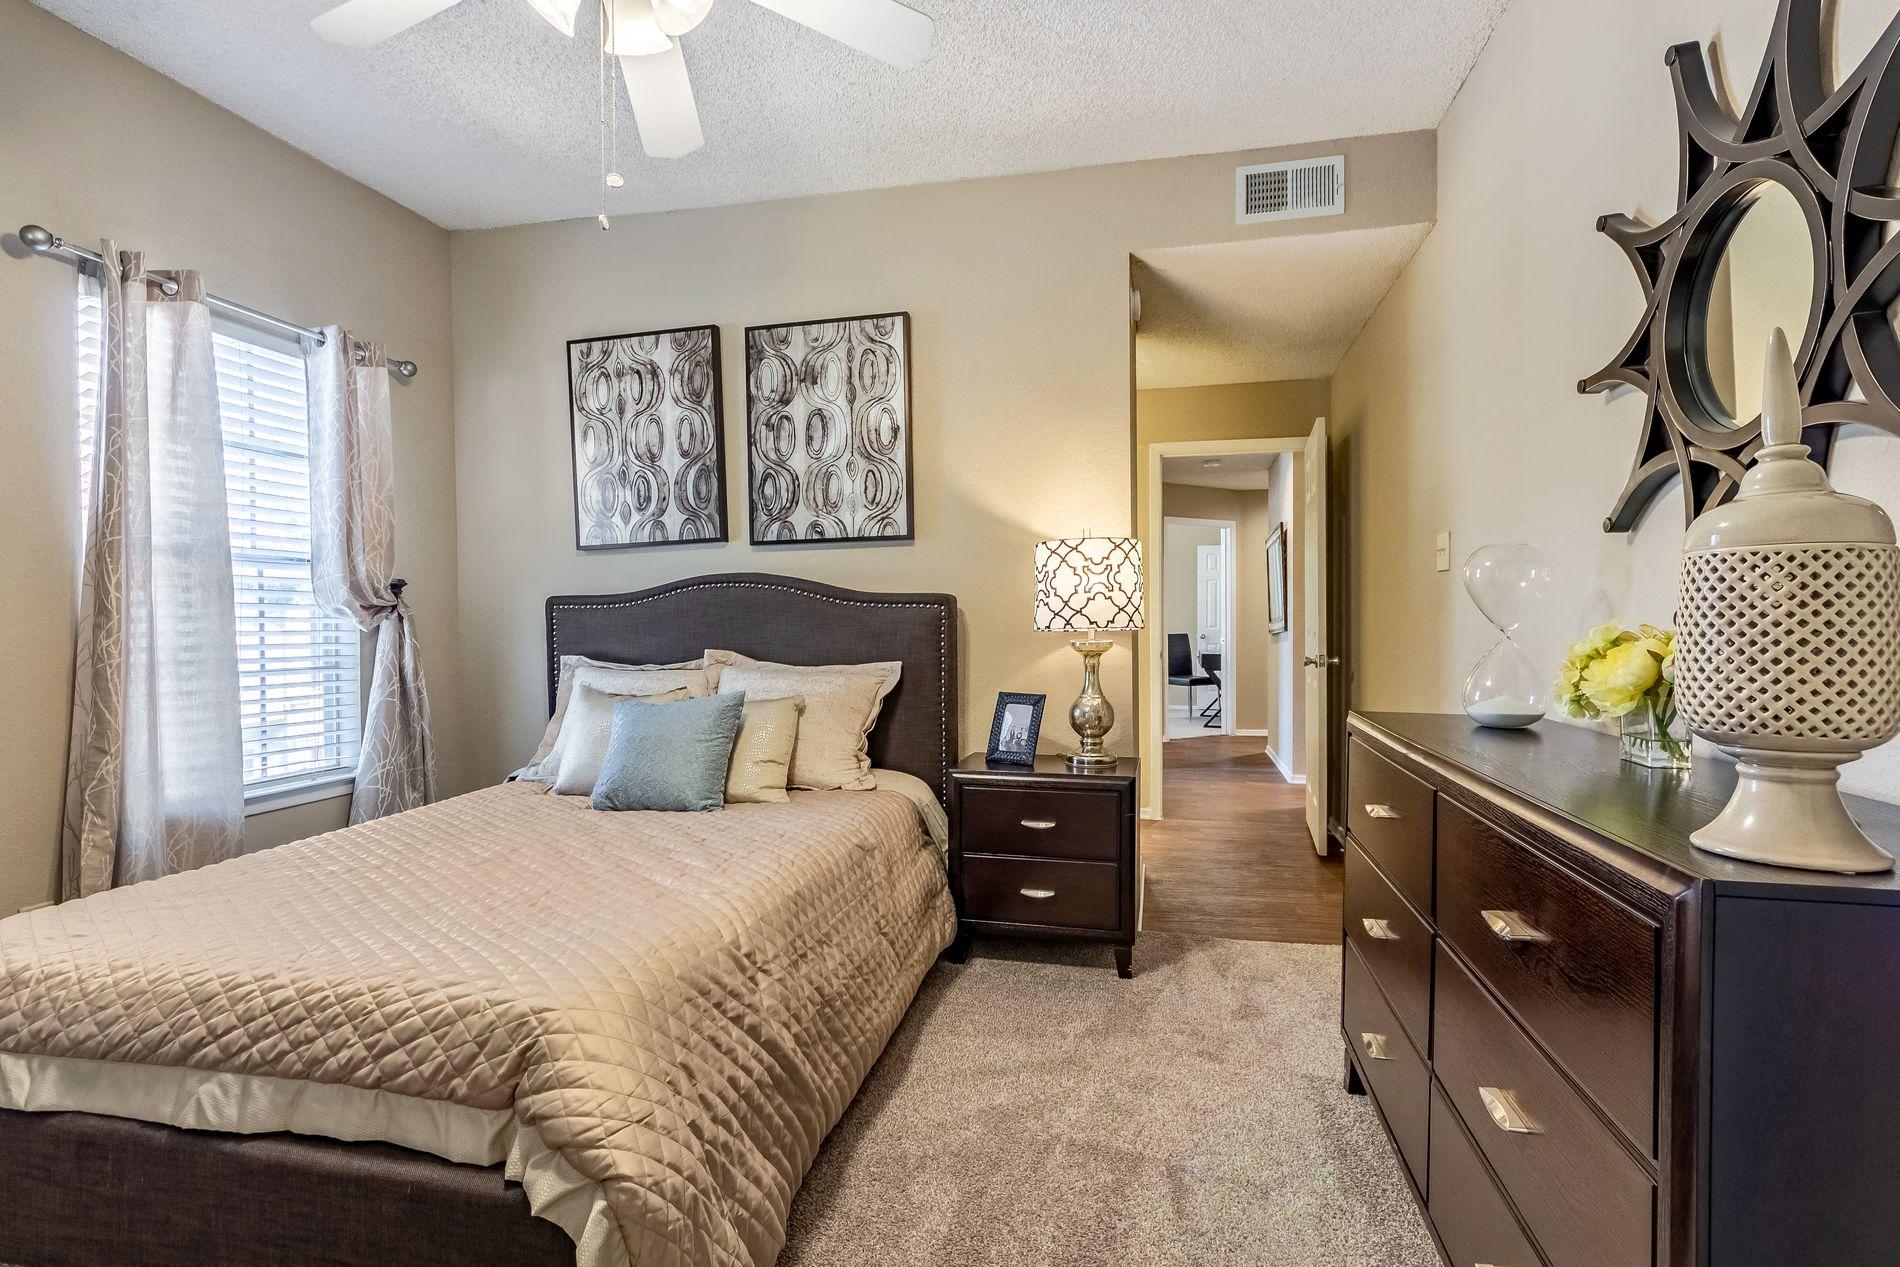 Model Master Bedroom at La Costa Apartments in Plano, Texas, TX